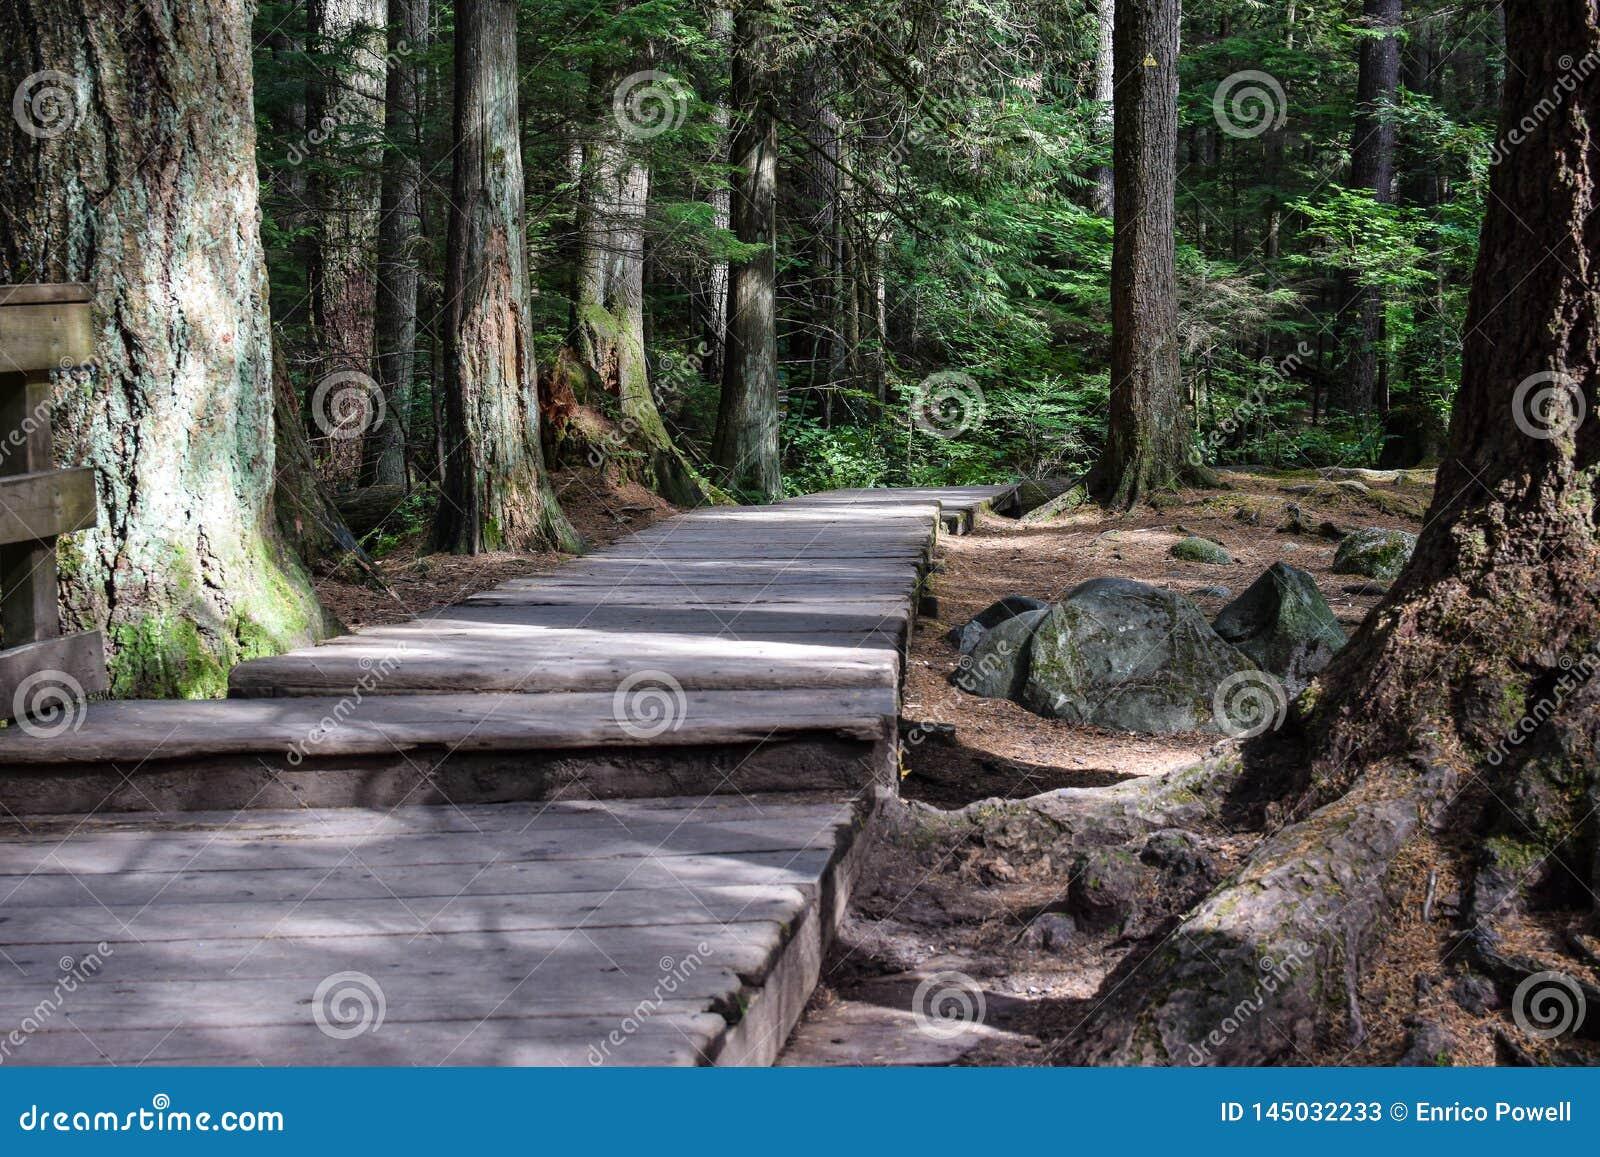 Promenadenbahn zwischen Moos bedeckten Bäumen